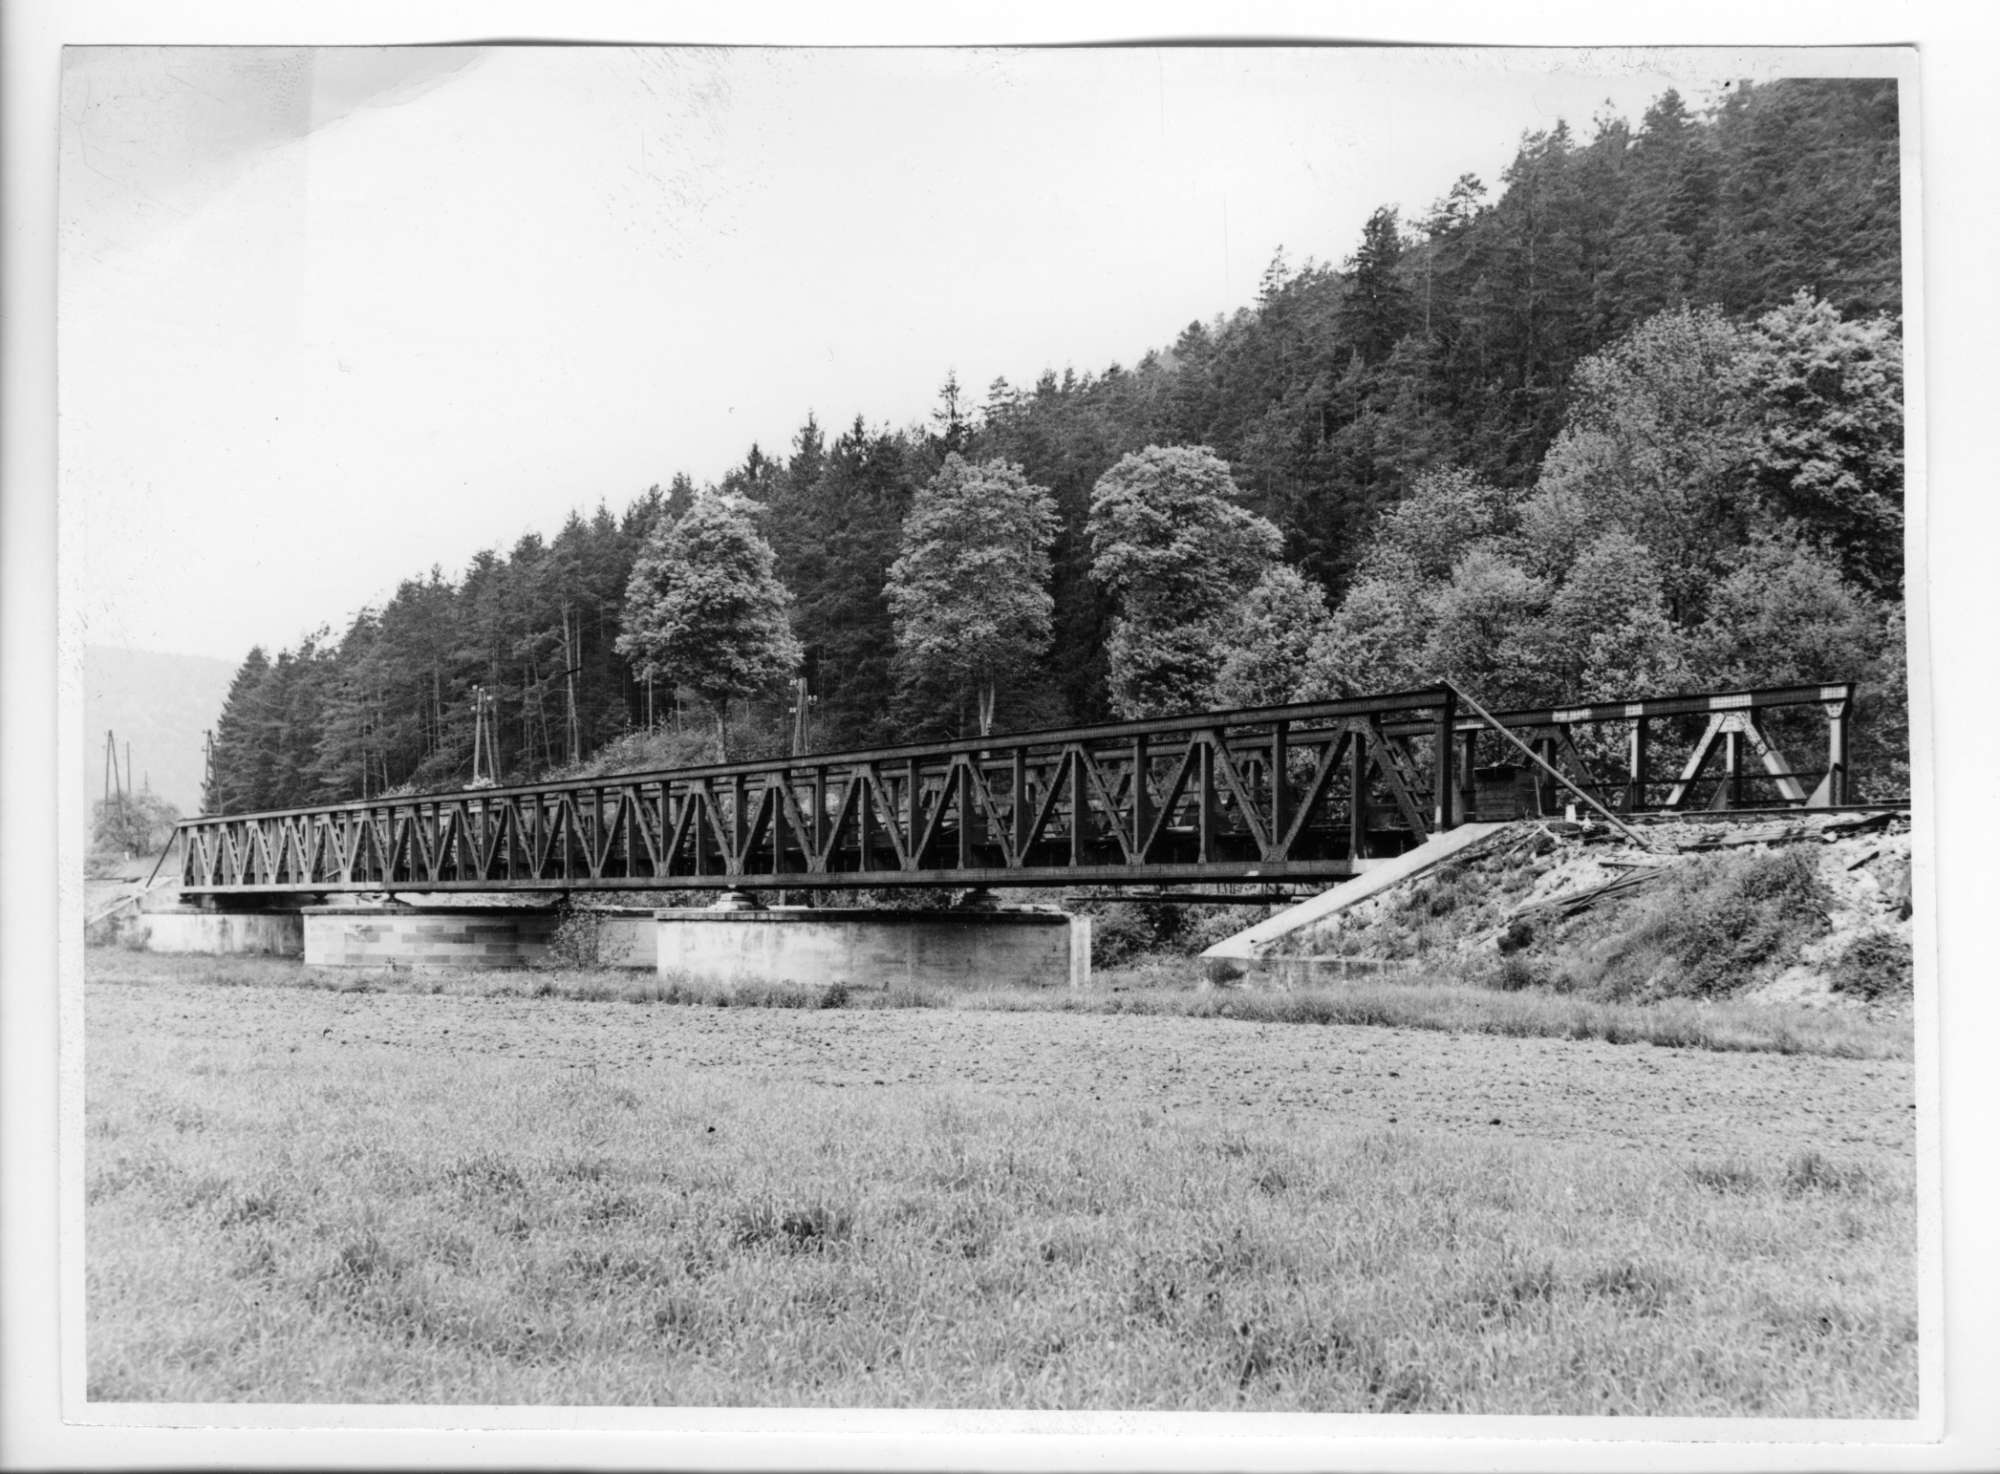 Strecke Neckarhausen-Horb (Neckarbrücke), Abb. c